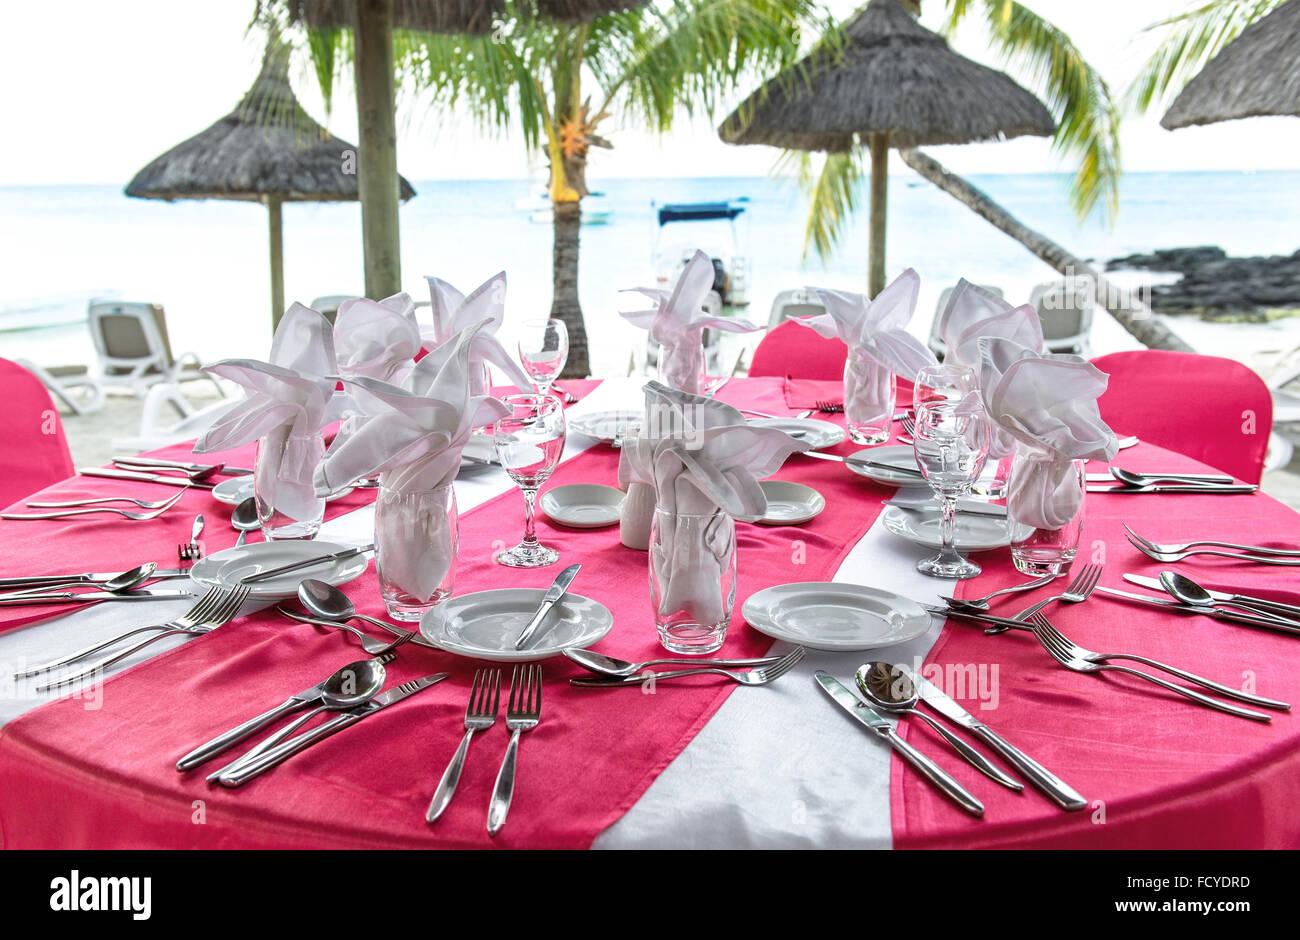 Romantic dinner on sunset beach. Festive pink table place setting ...